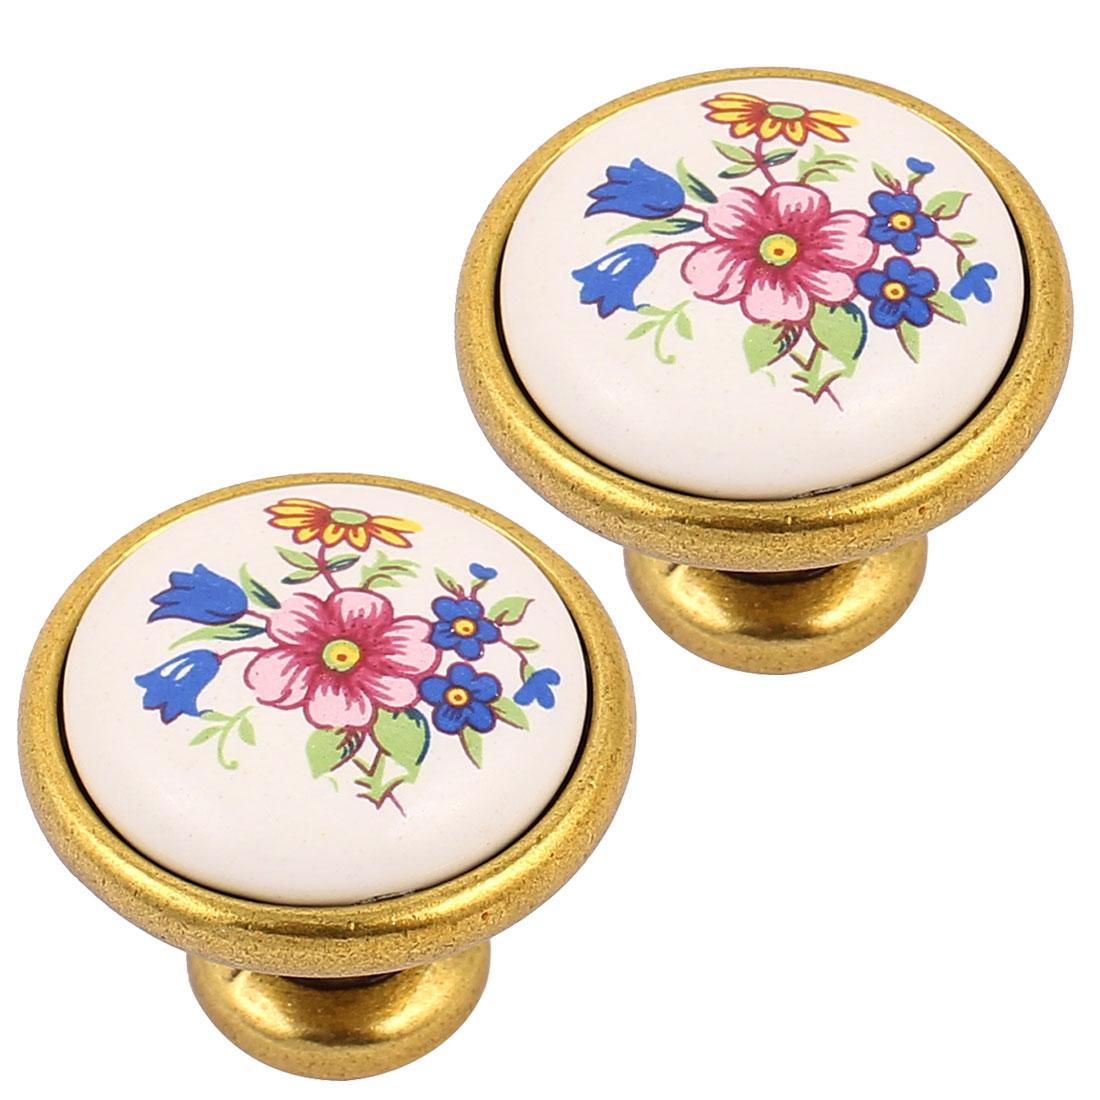 Cabinet Wardrobe Drawer Door Pull Blue Flower Pattern Ceramic Knobs Brass Tone 2pcs